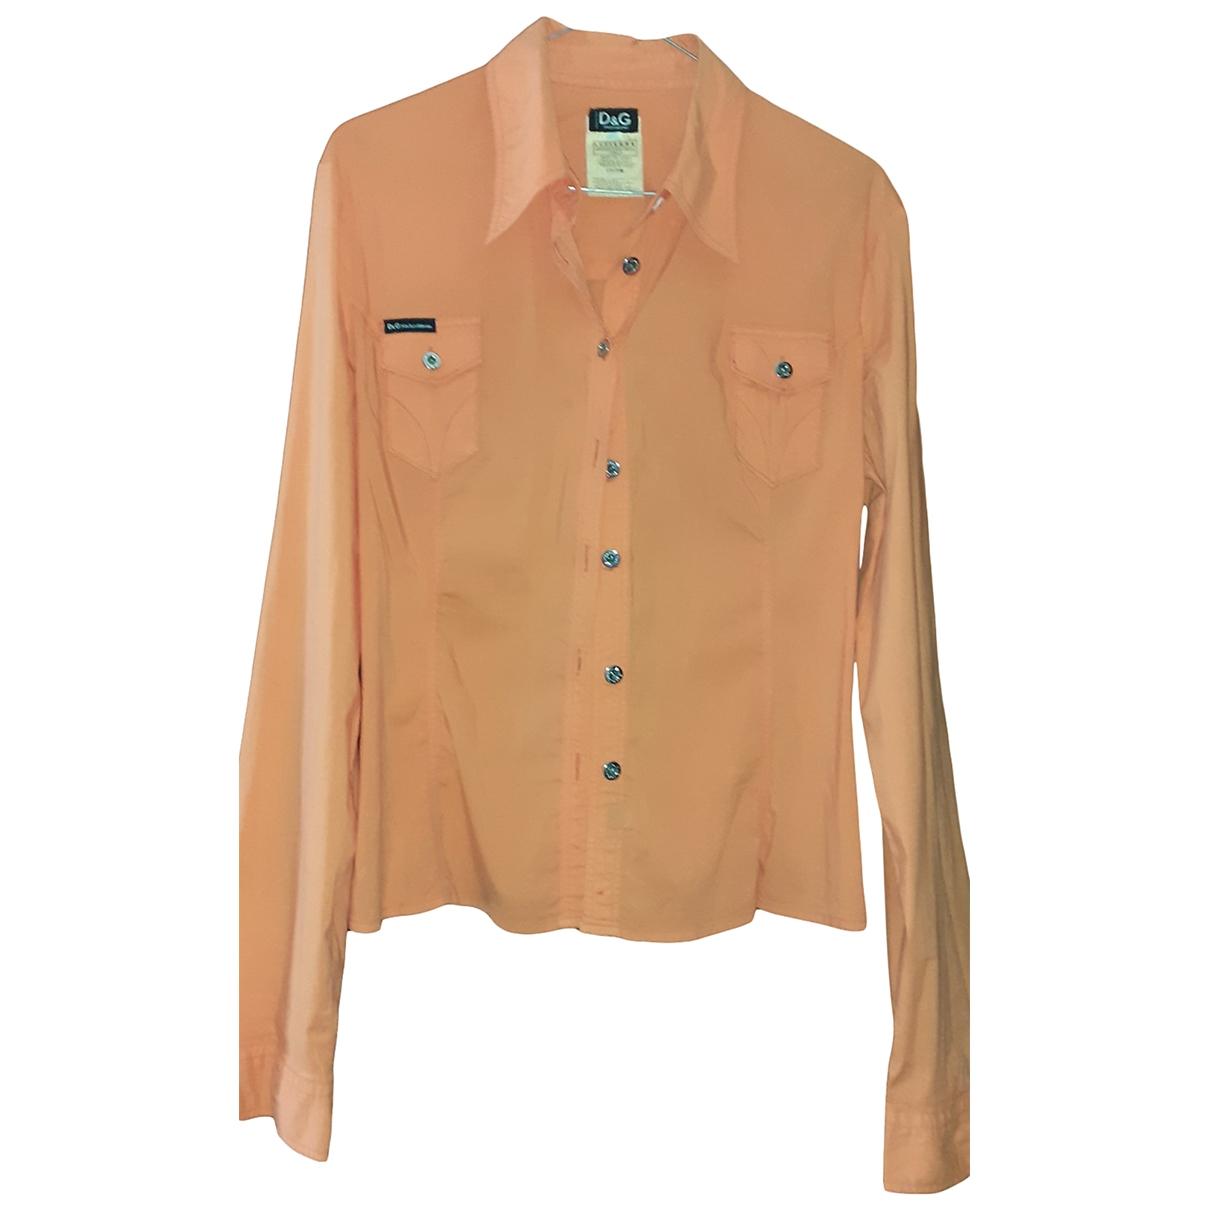 D&g \N Orange Cotton dress for Women 46 FR